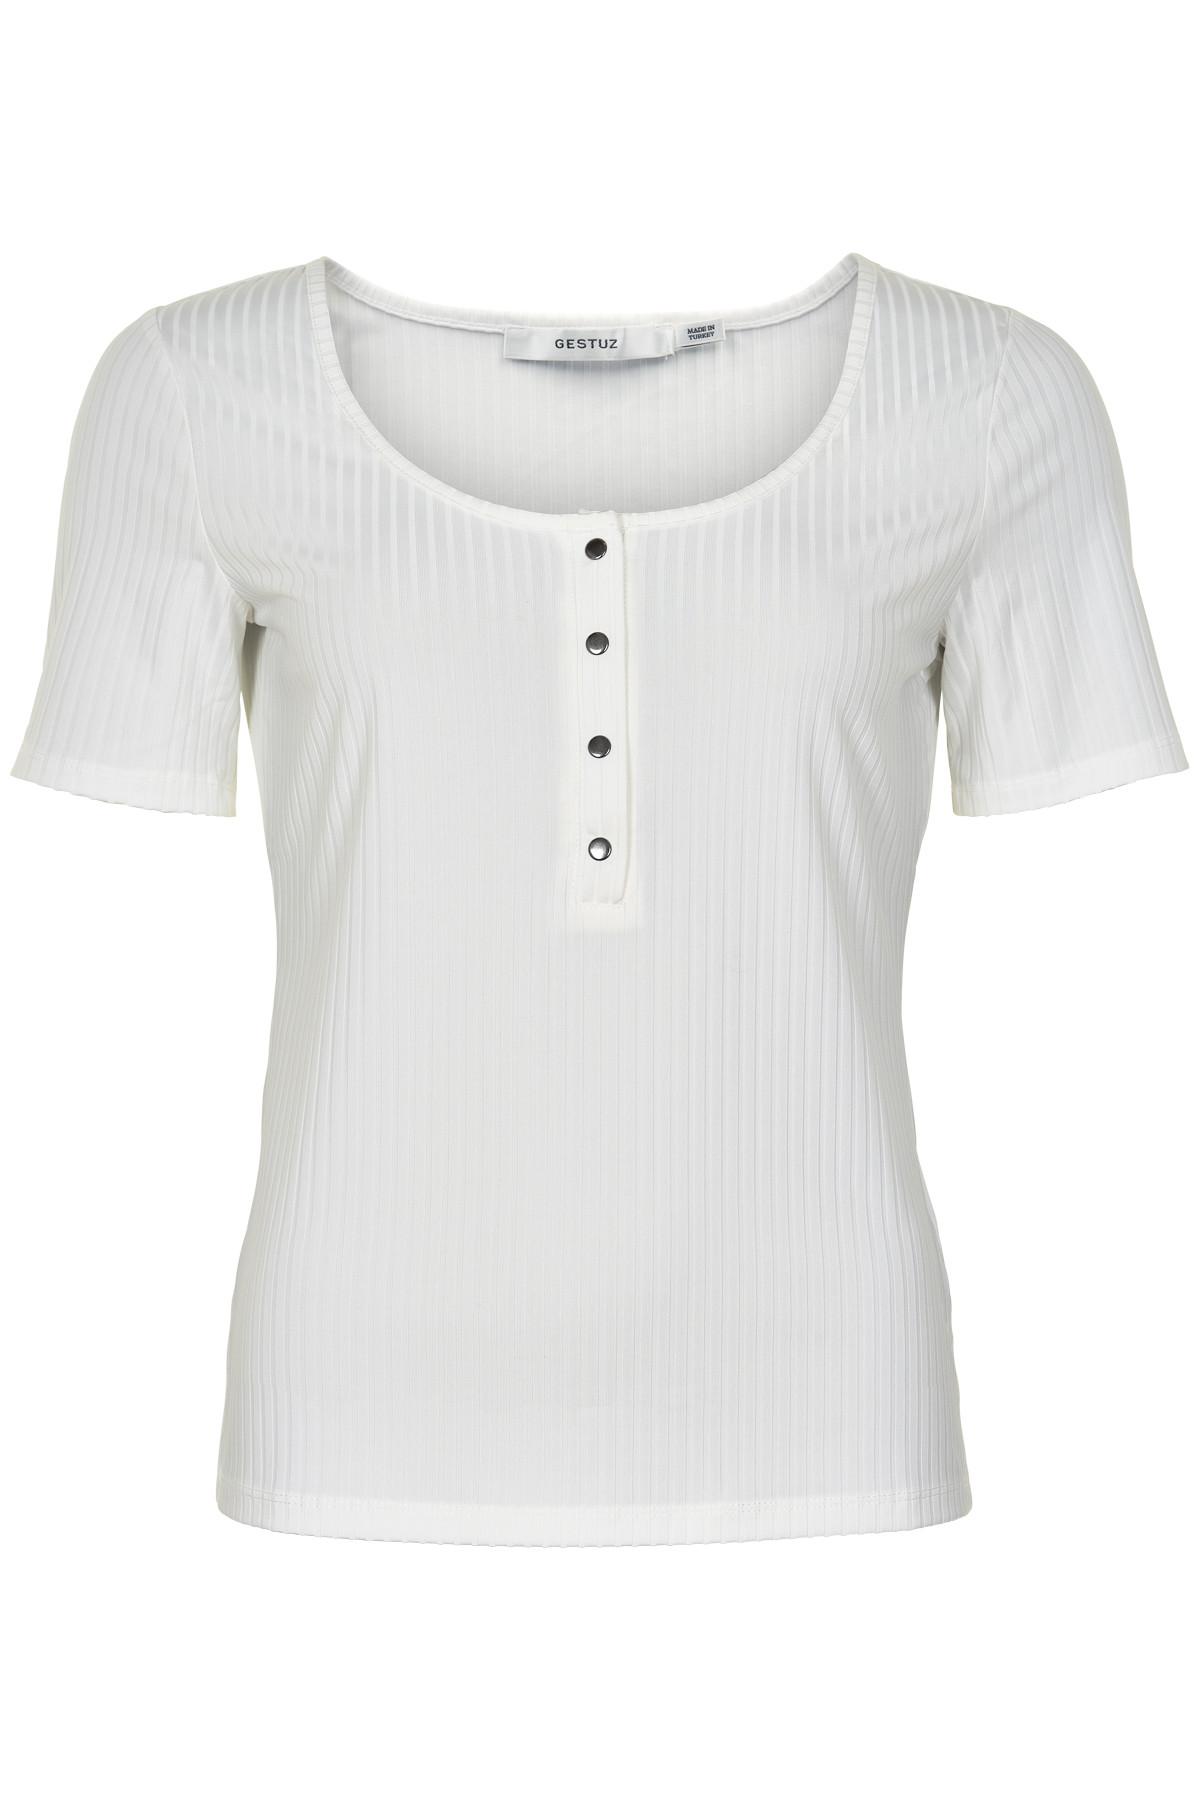 Image of   GESTUZ ROLLOGZ T-SHIRT B (Bright White 90014, XS)